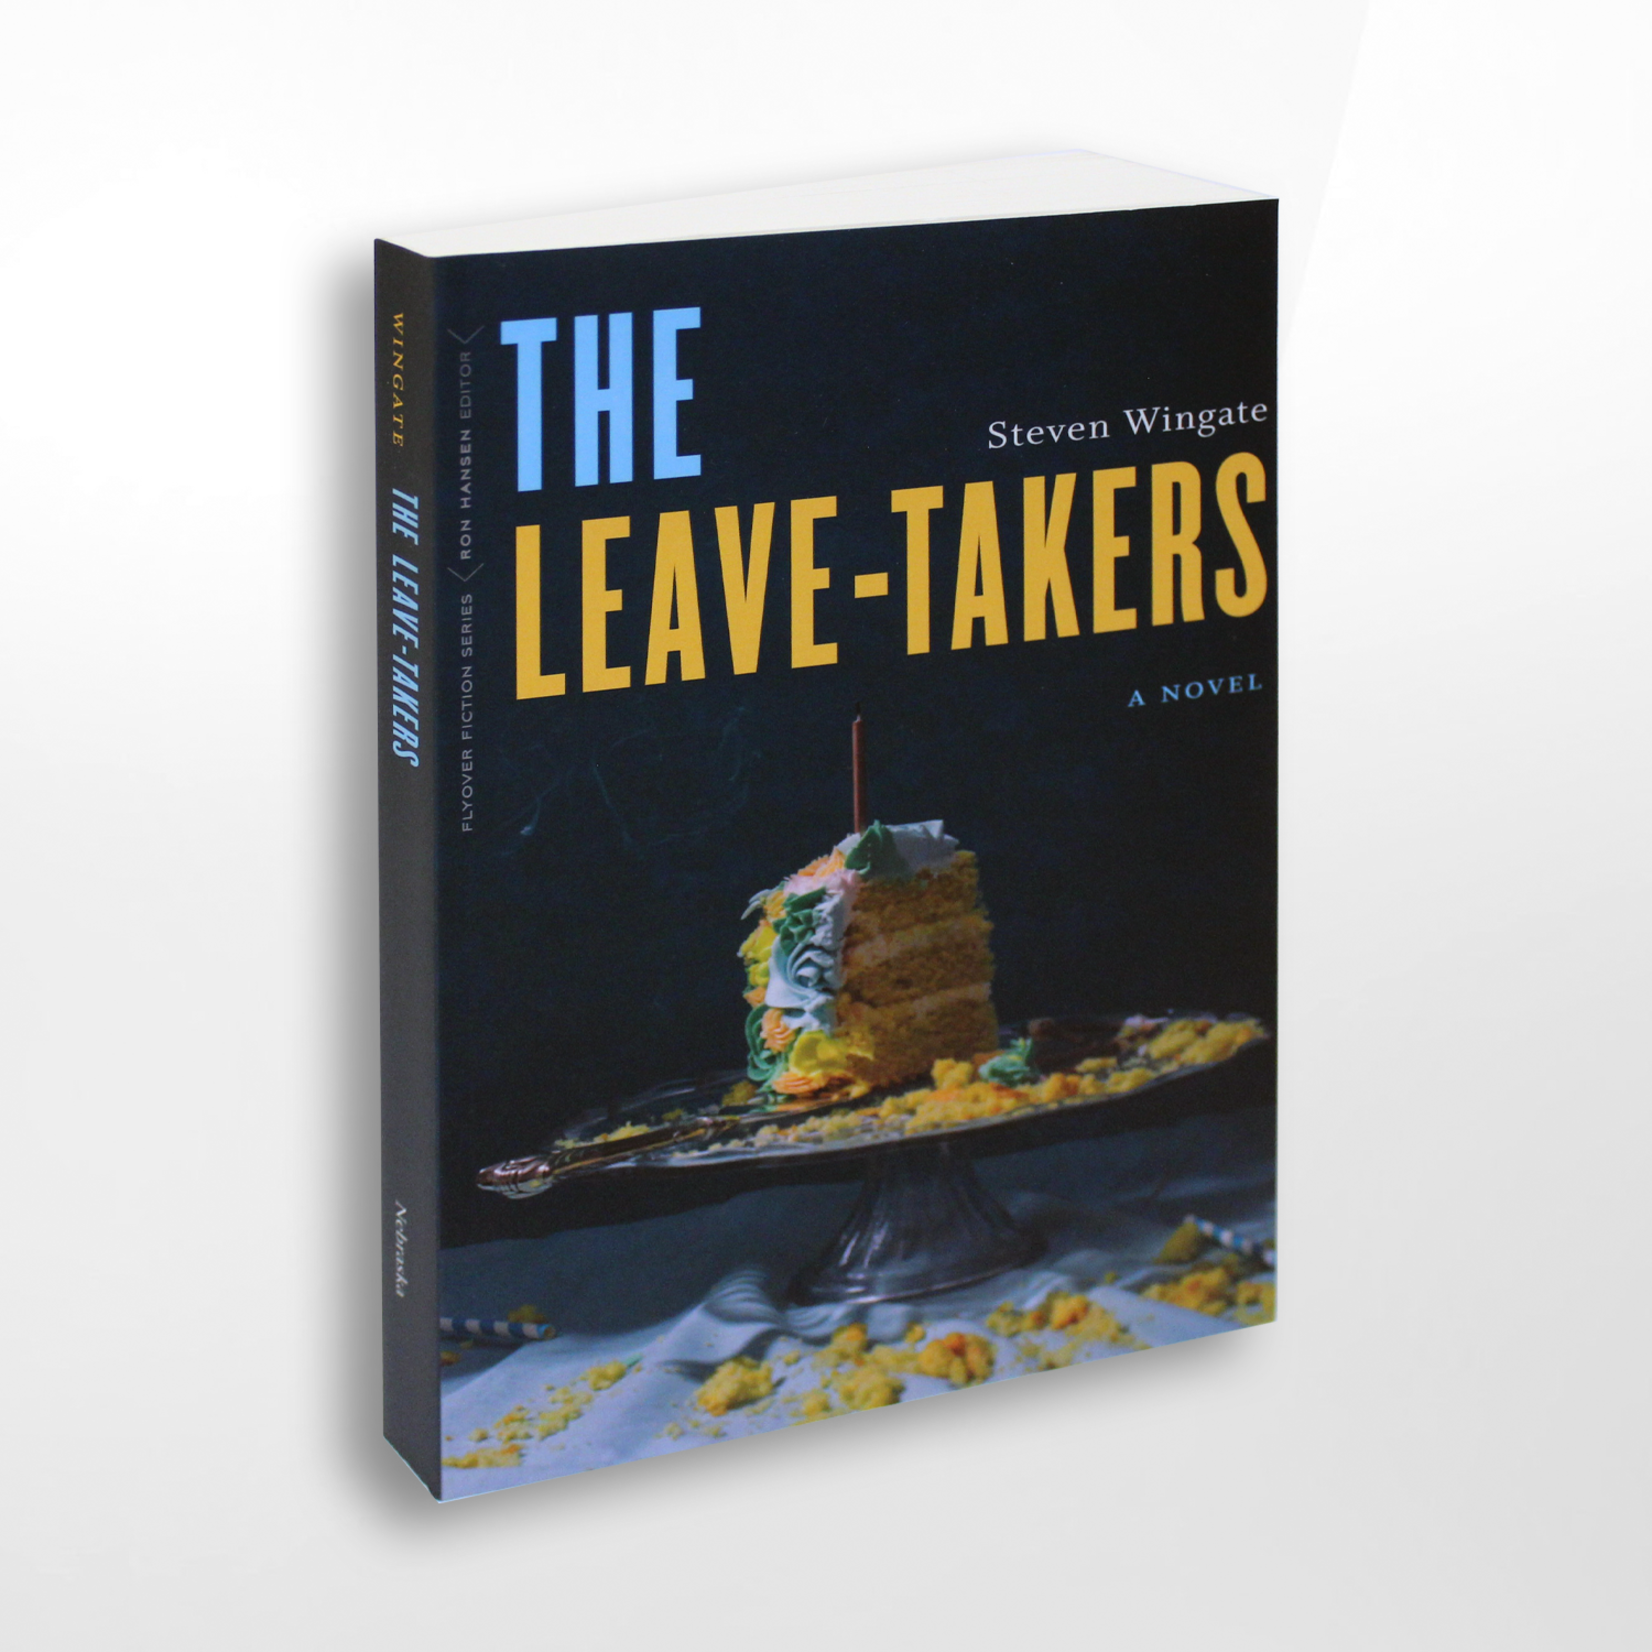 Ingram The Leave-Takers, Steven Wingate